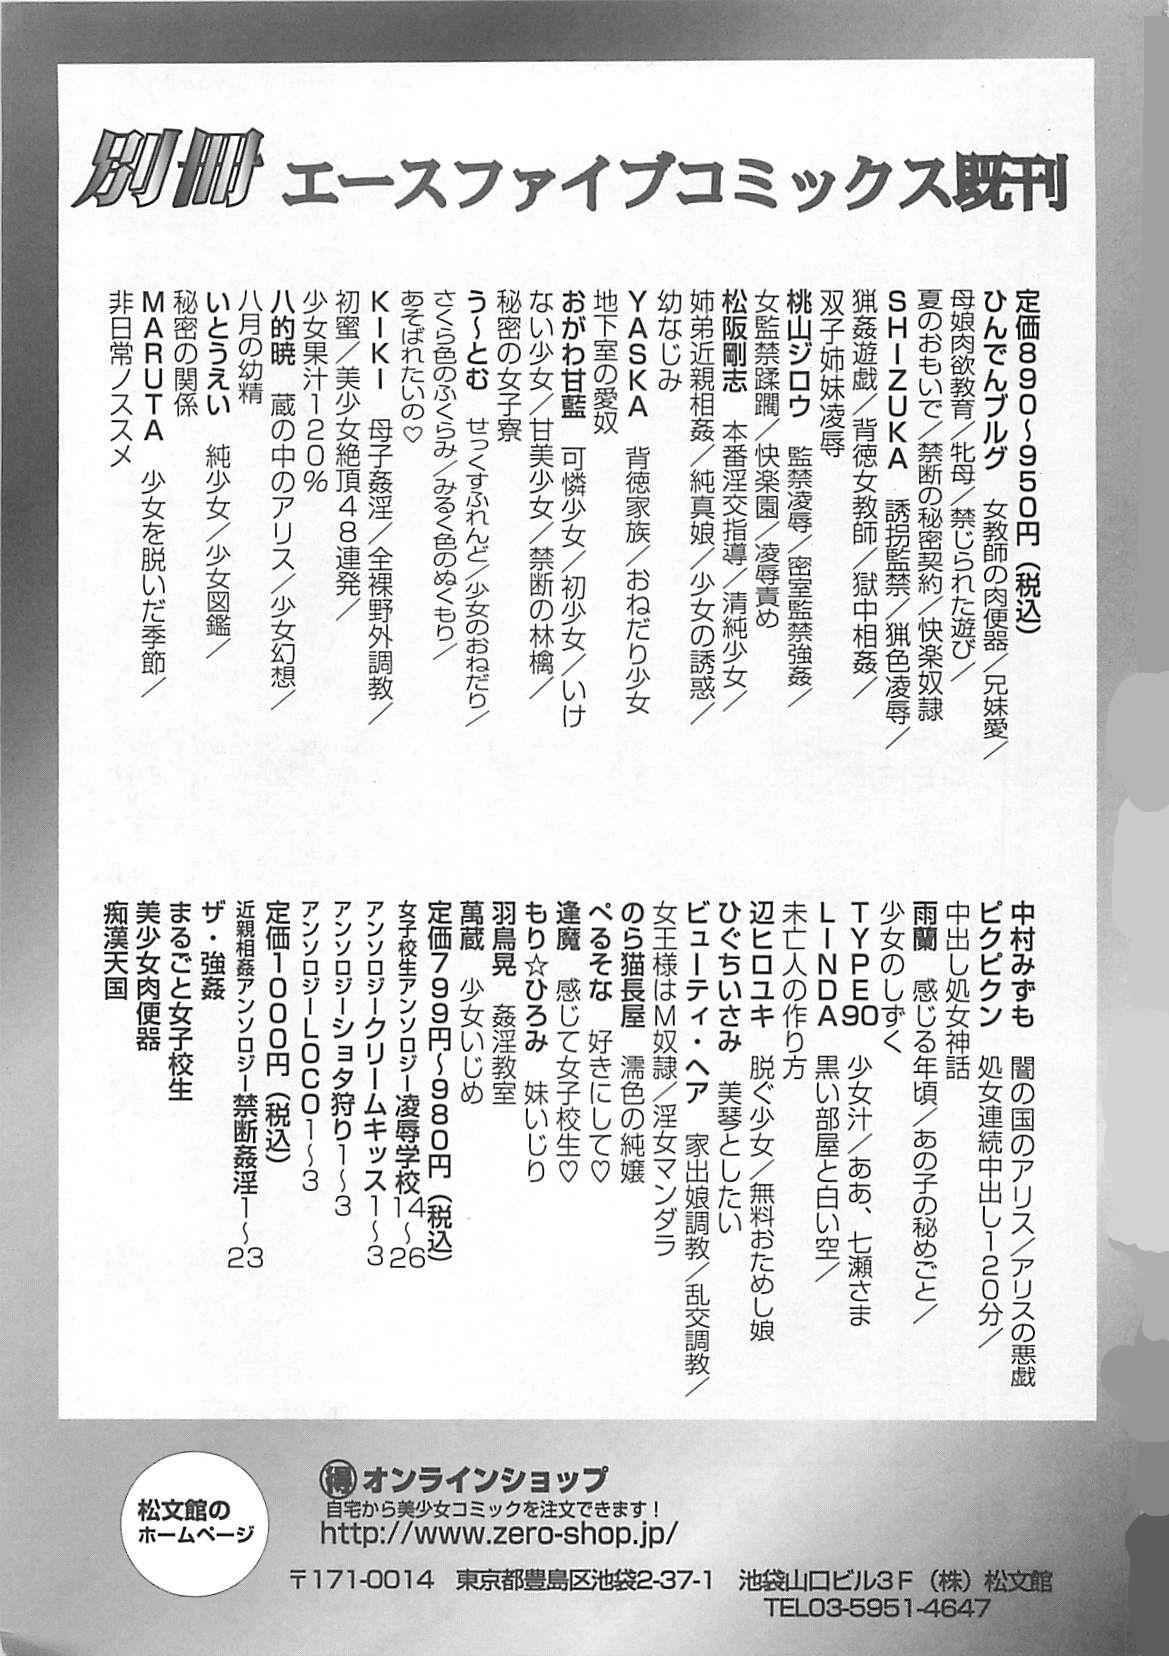 Kanin Kyoushitsu - Adultery Classroom 151